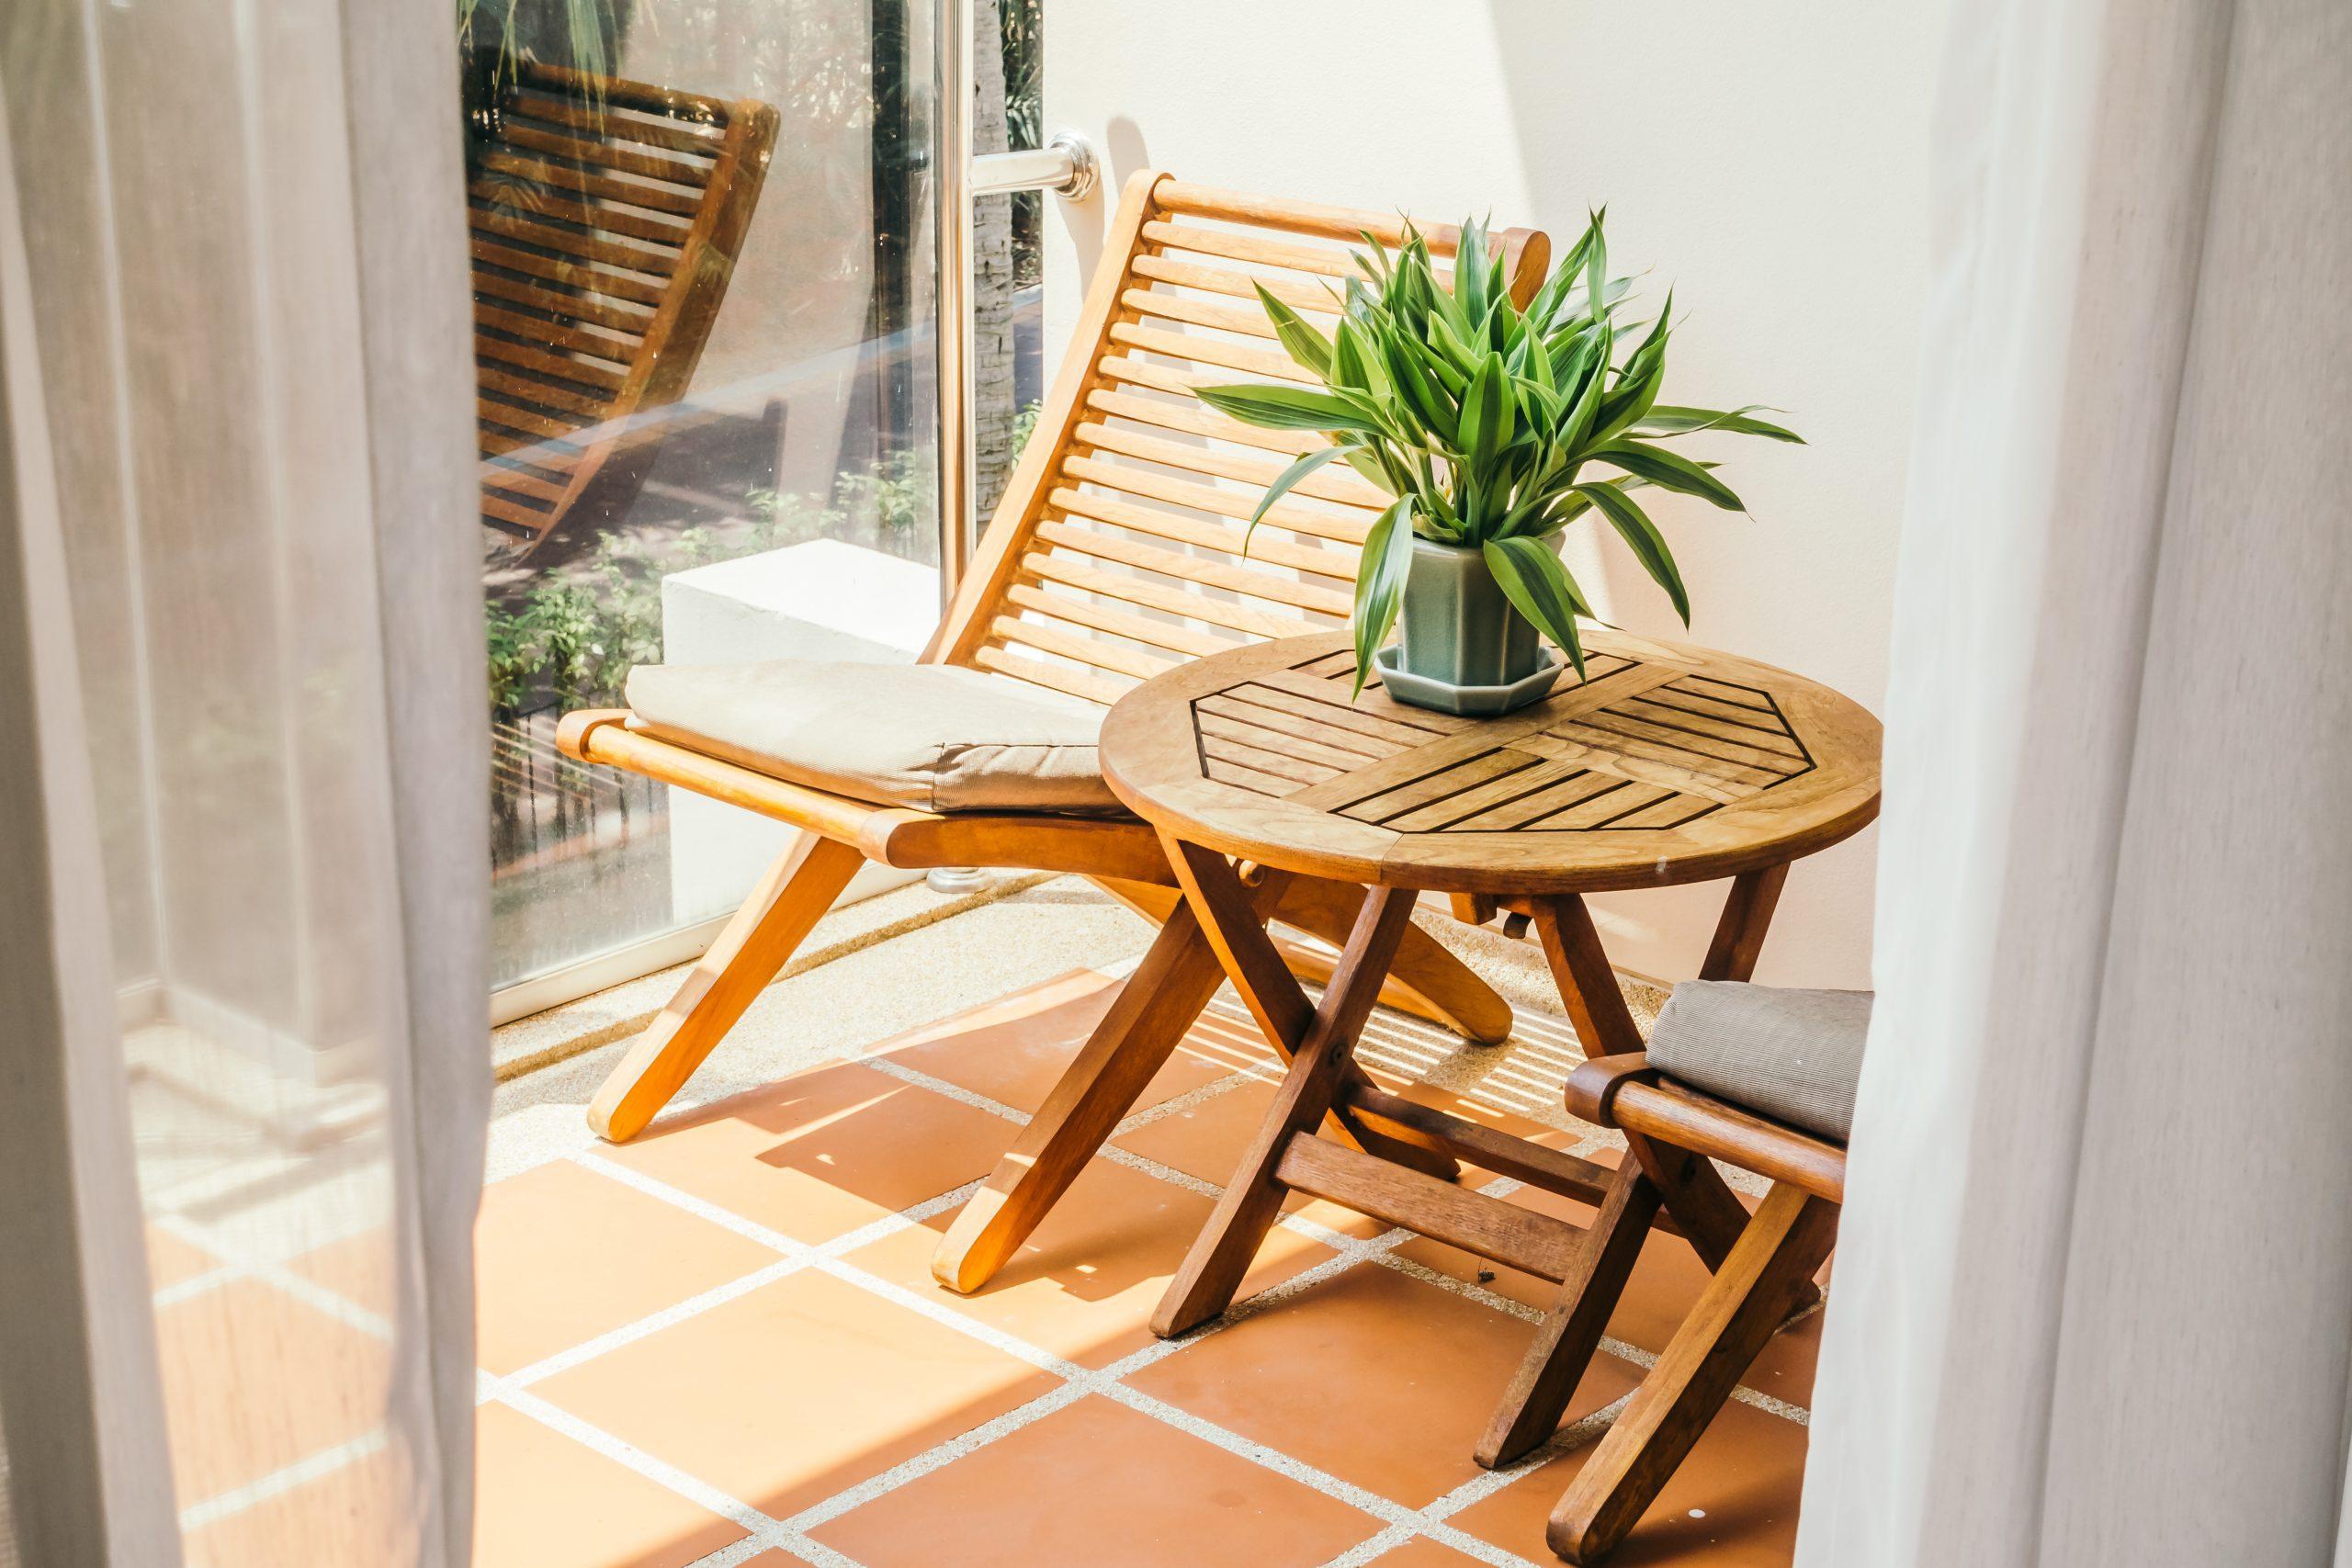 Inspirasi Perabotan Kayu untuk Apartemen